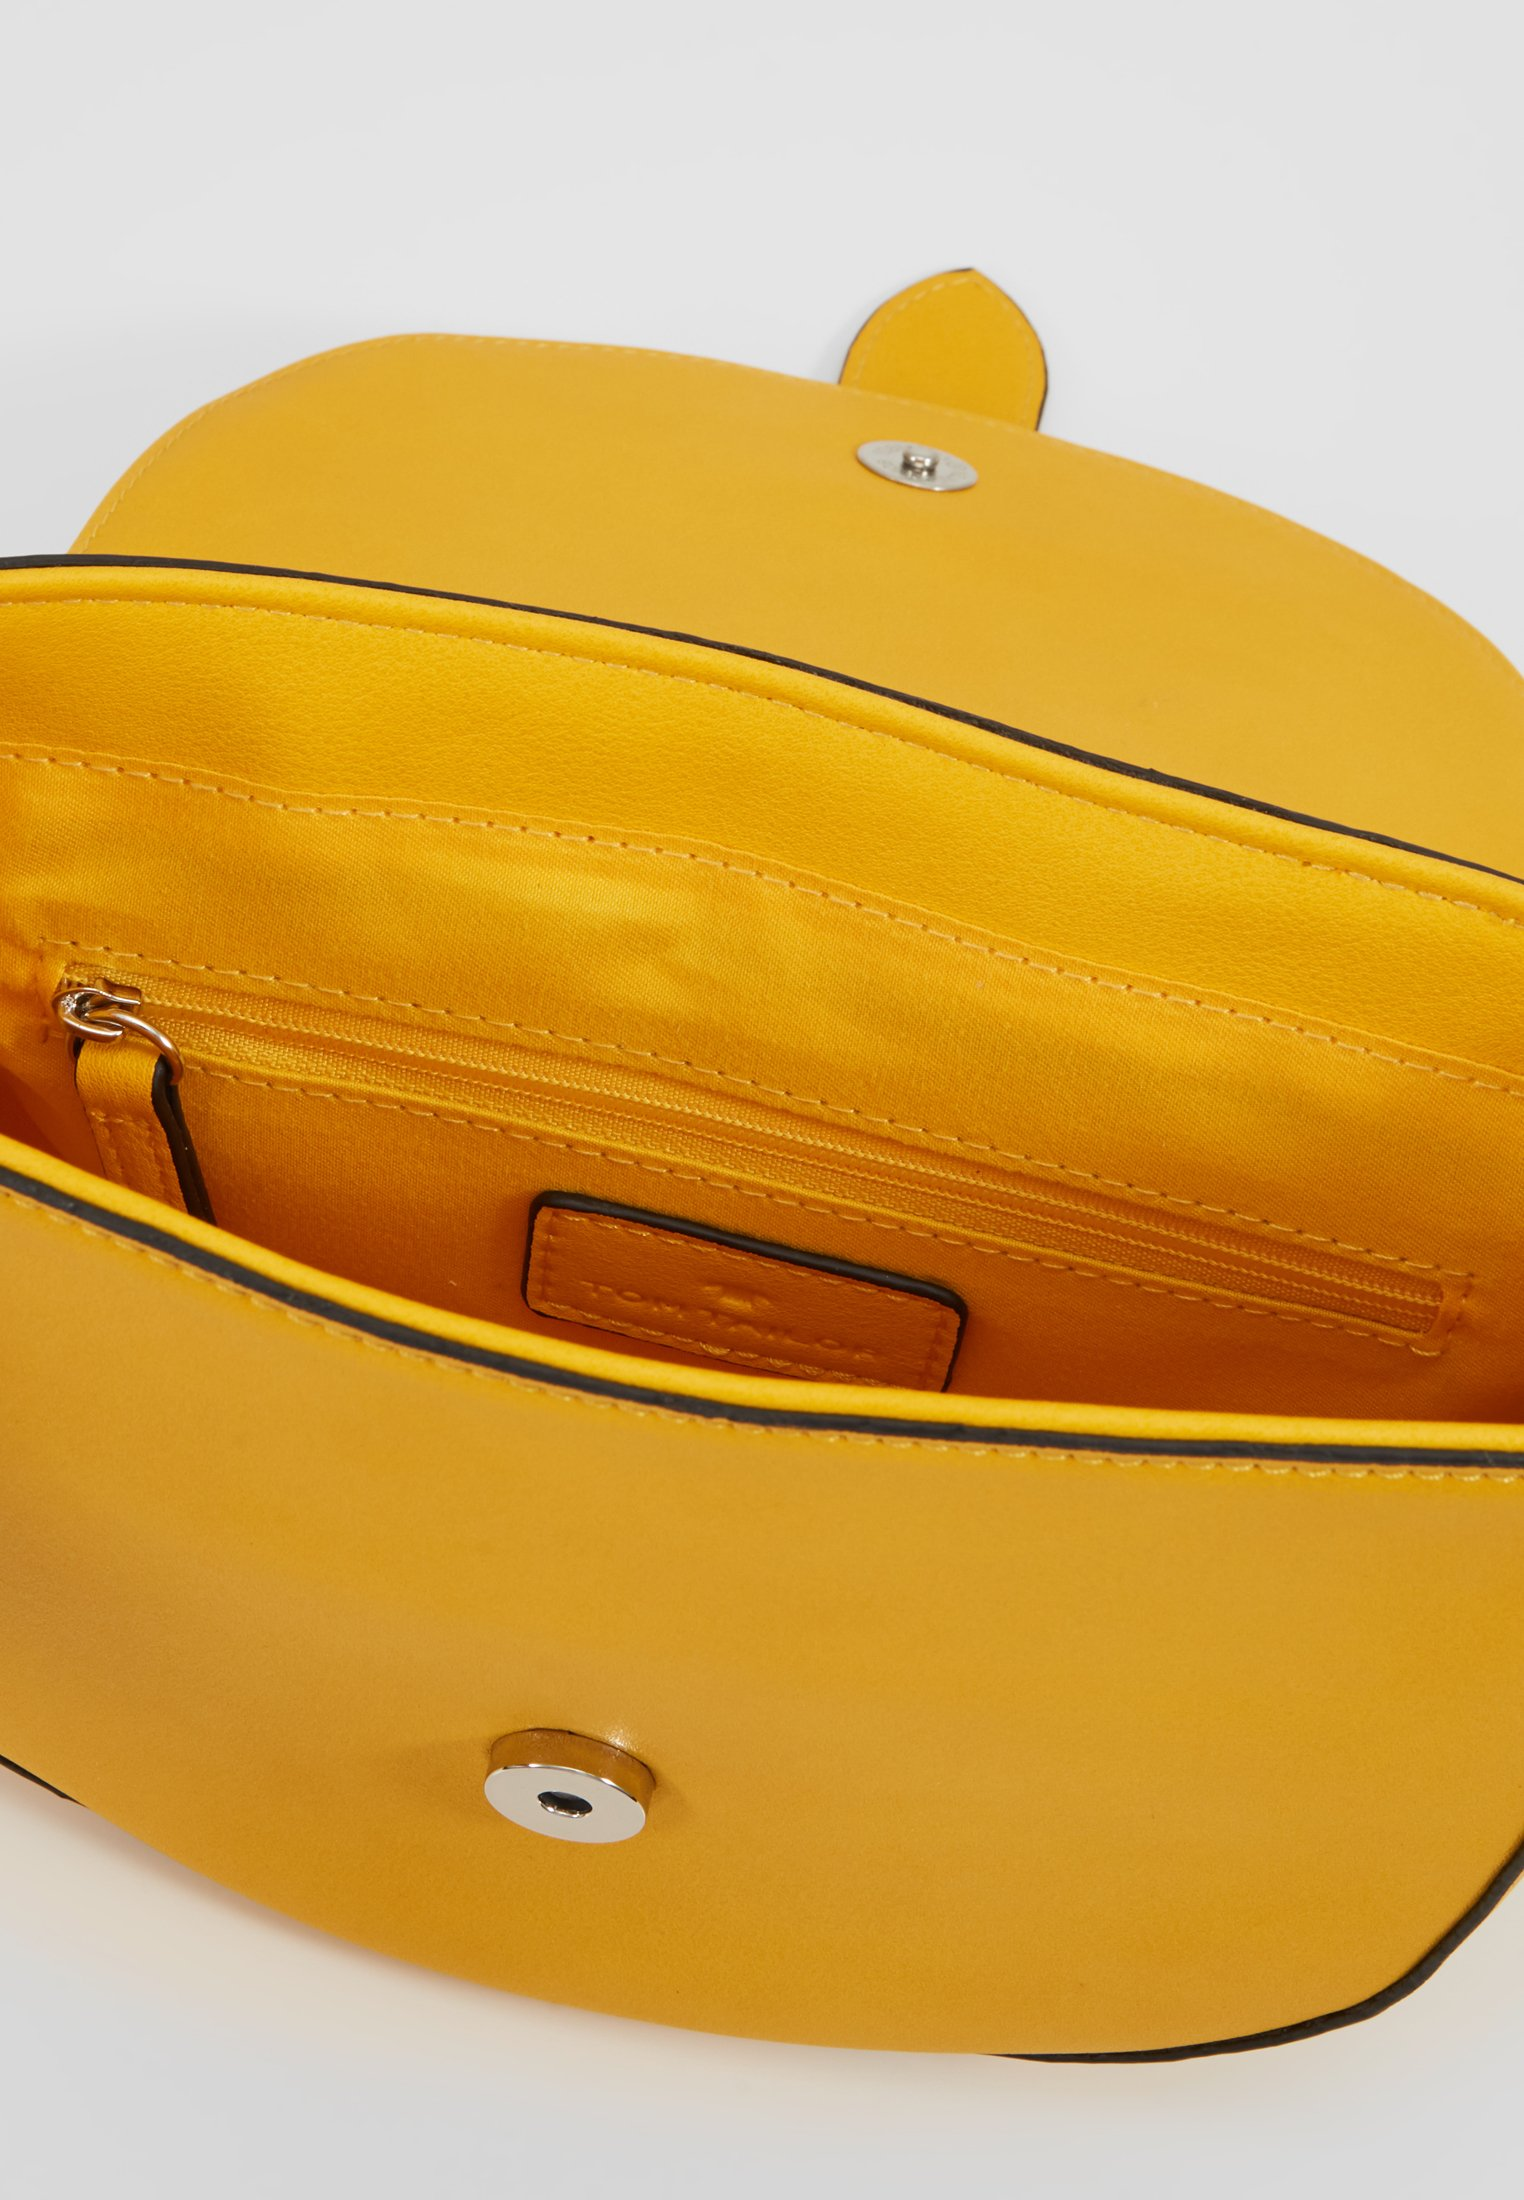 TOM TAILOR MATERA - Skulderveske - yellow/gul Rd0v8uh6dKaQfxu